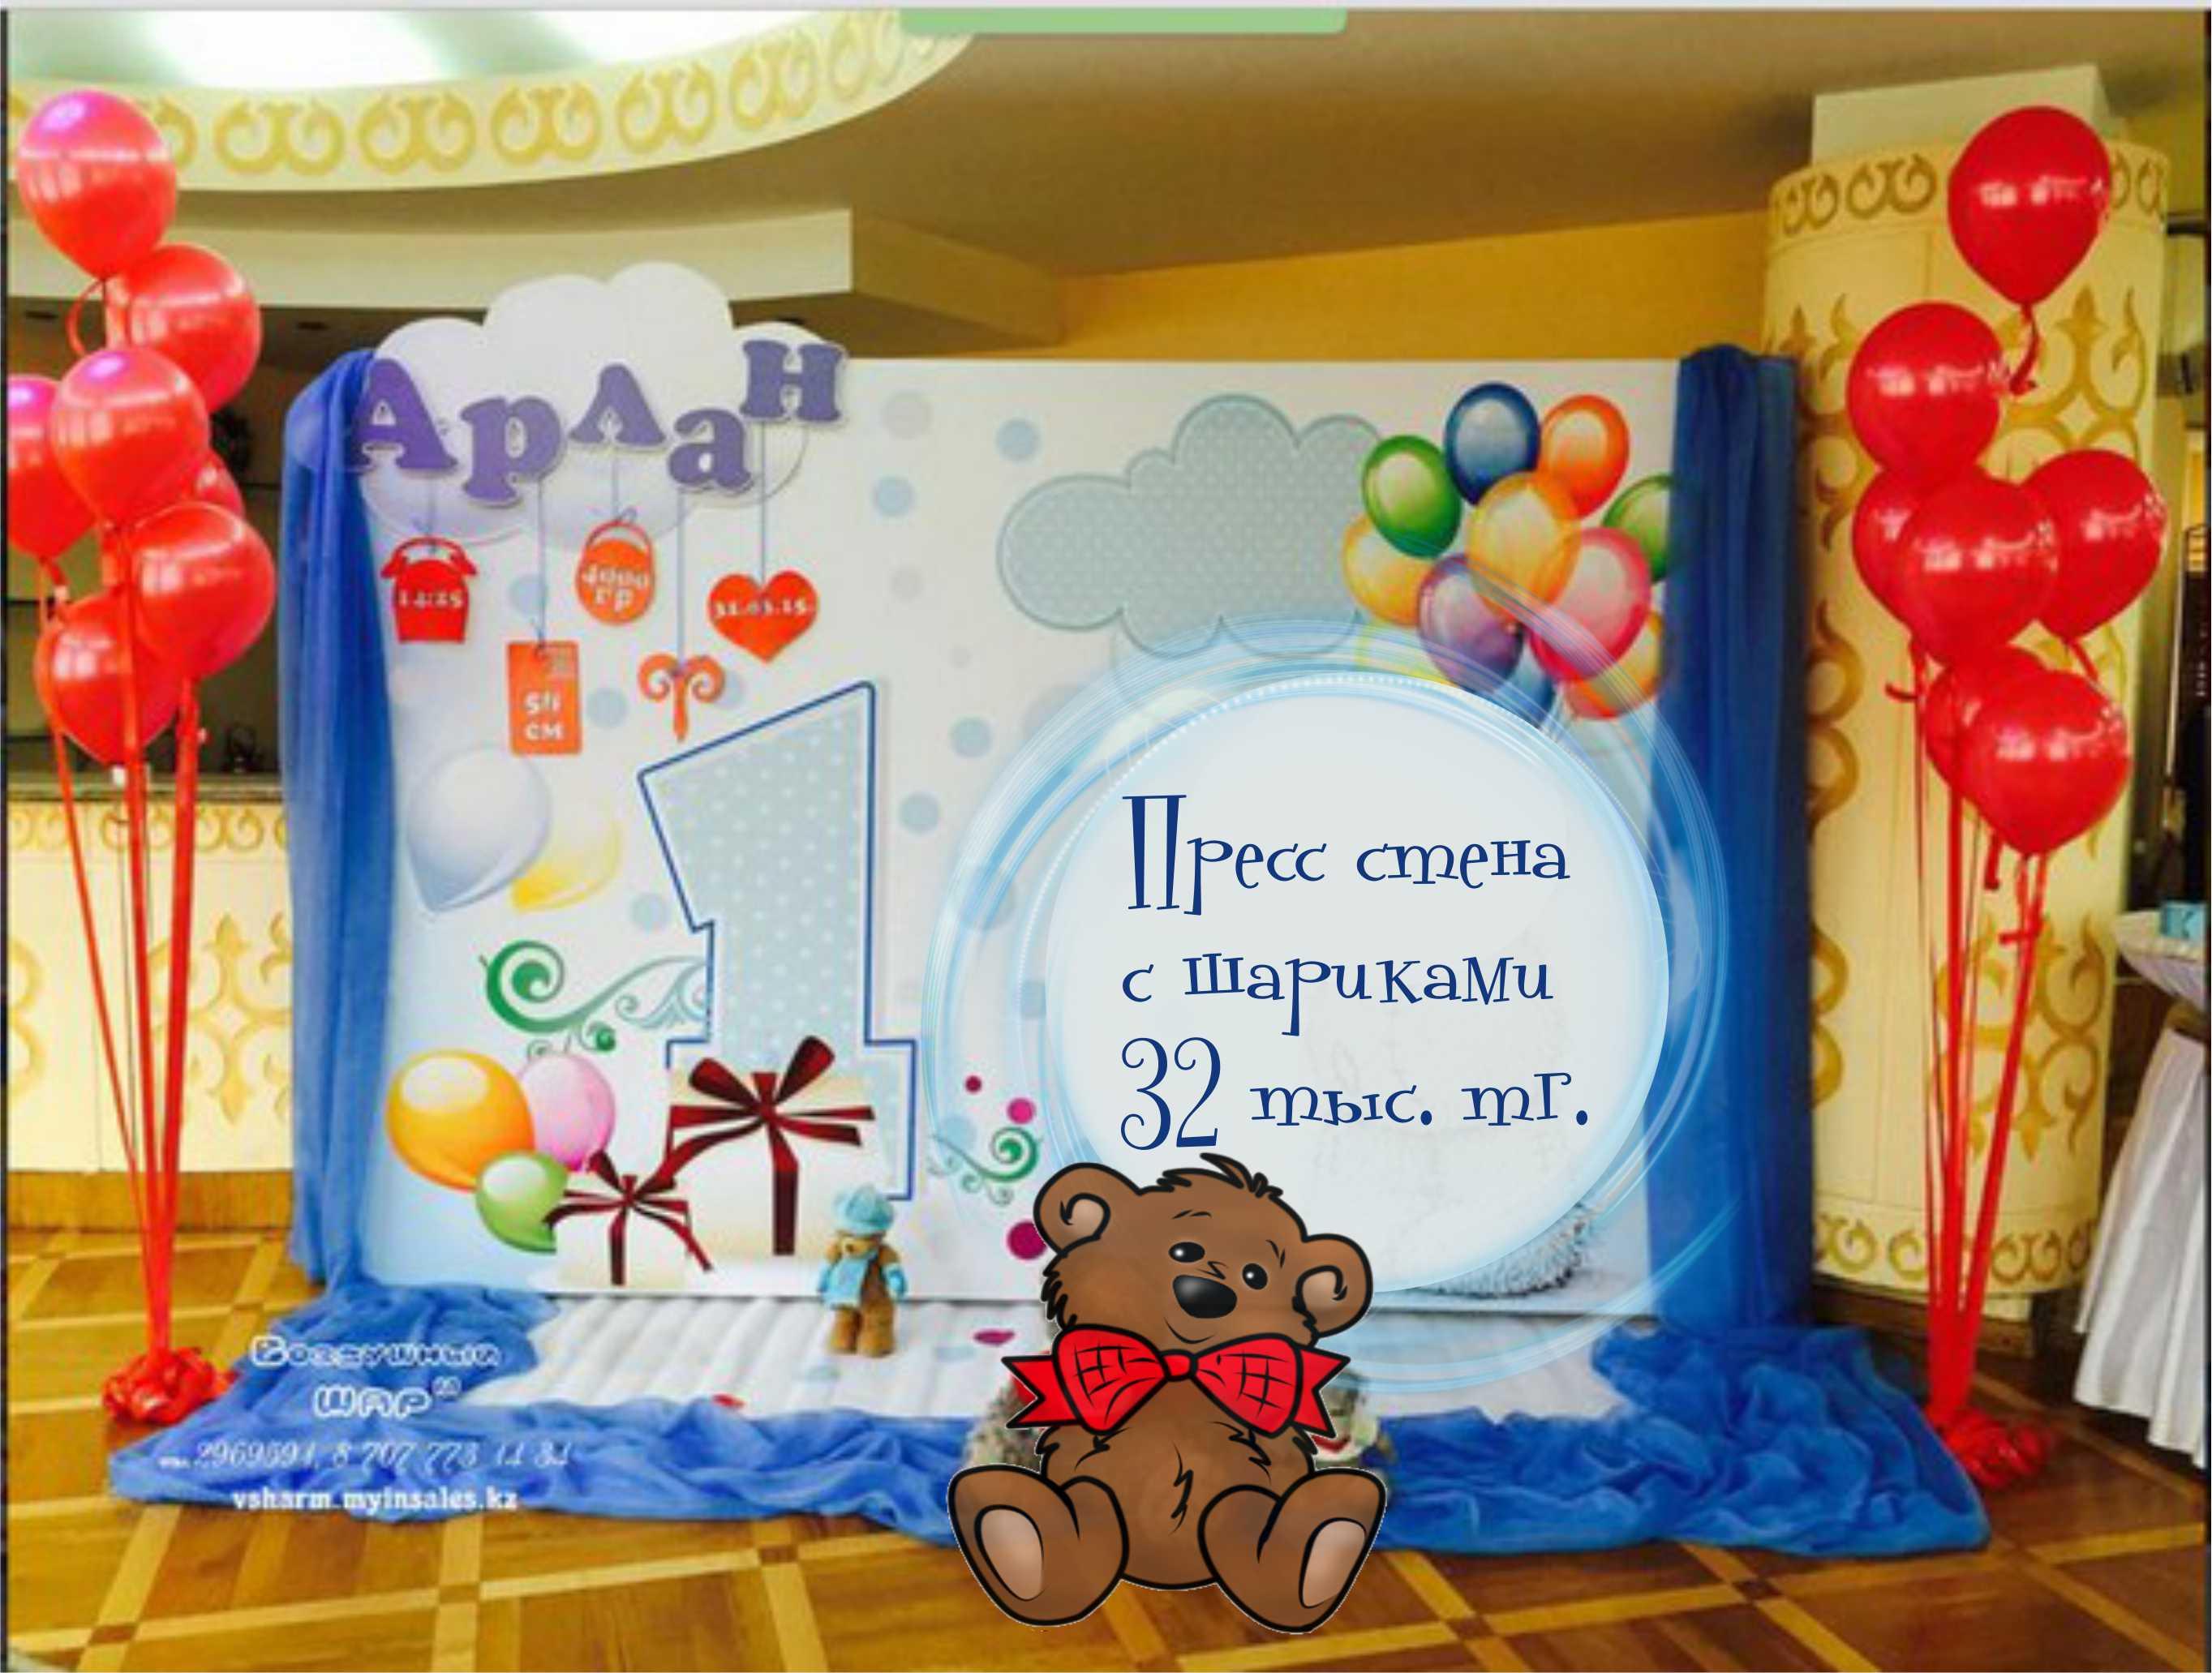 Пресс_стена_на_годик_Алматы_18.jpg